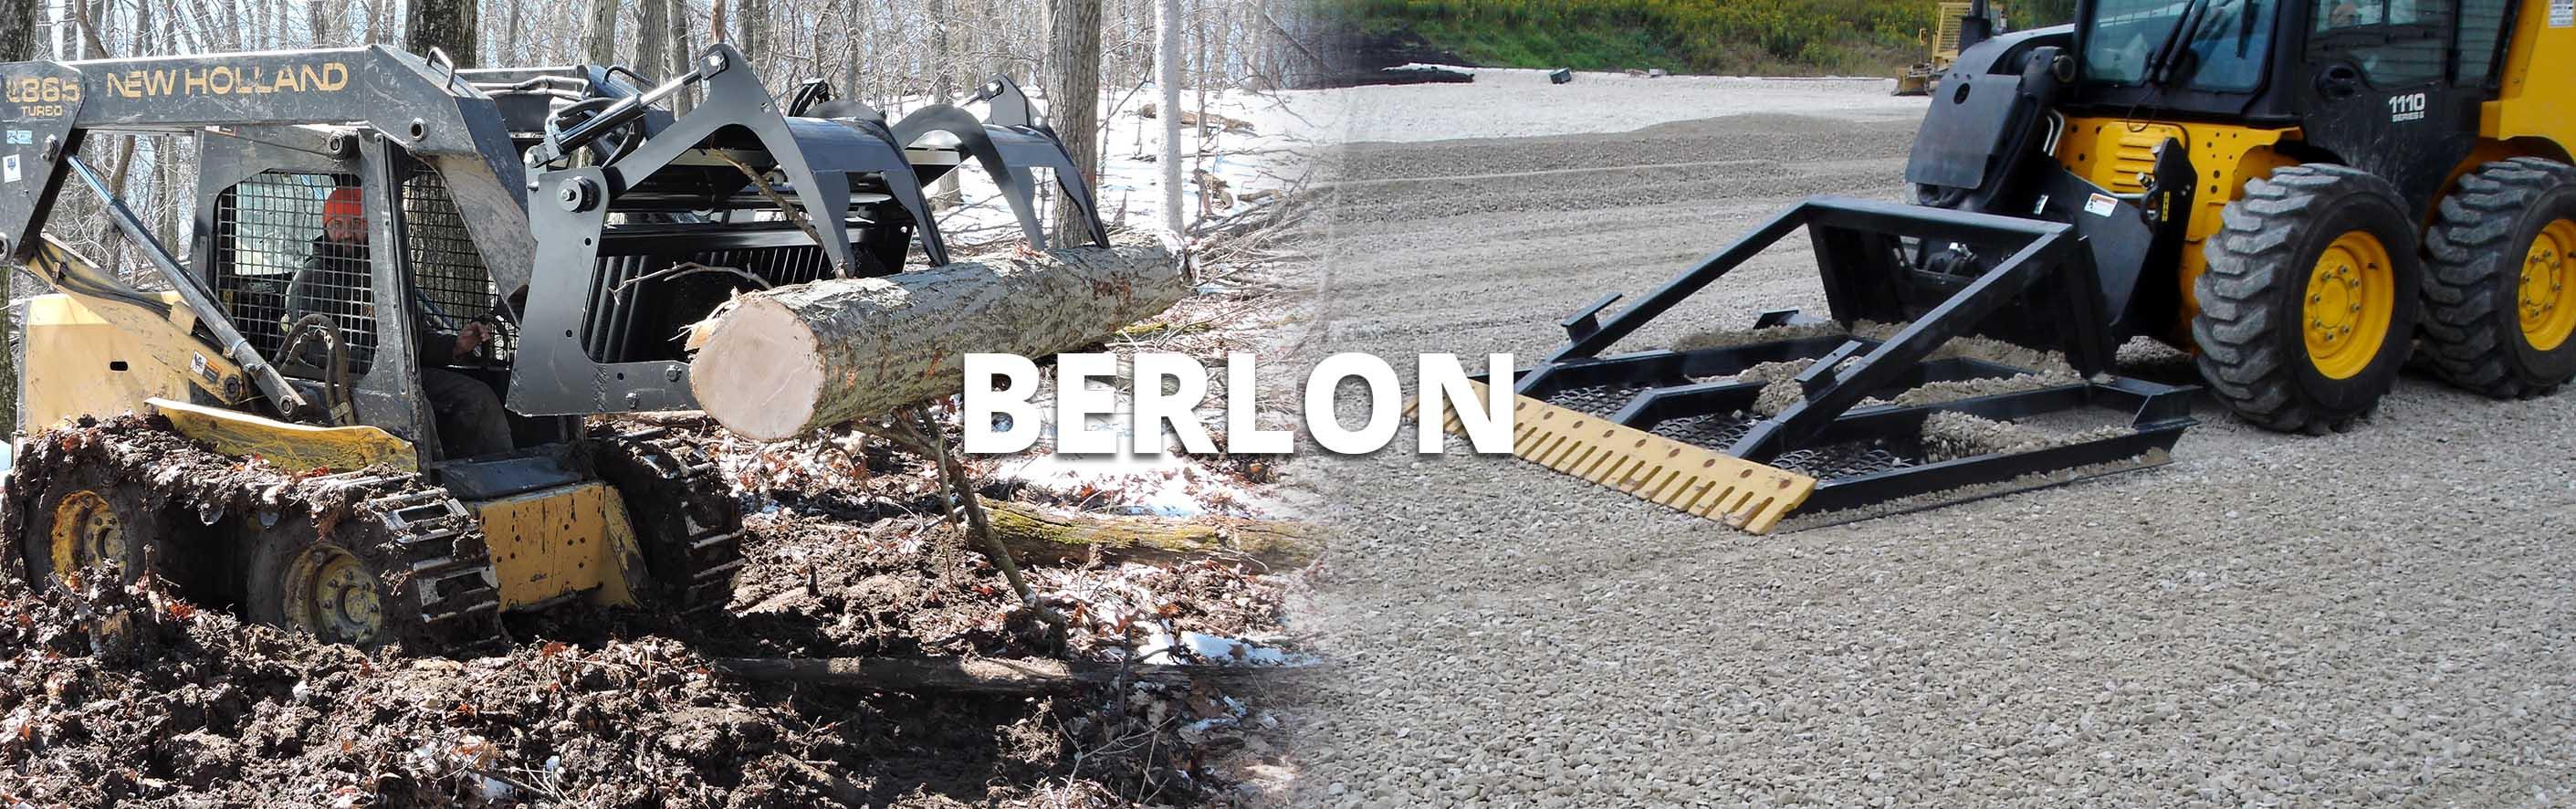 Berlon-banner.jpg